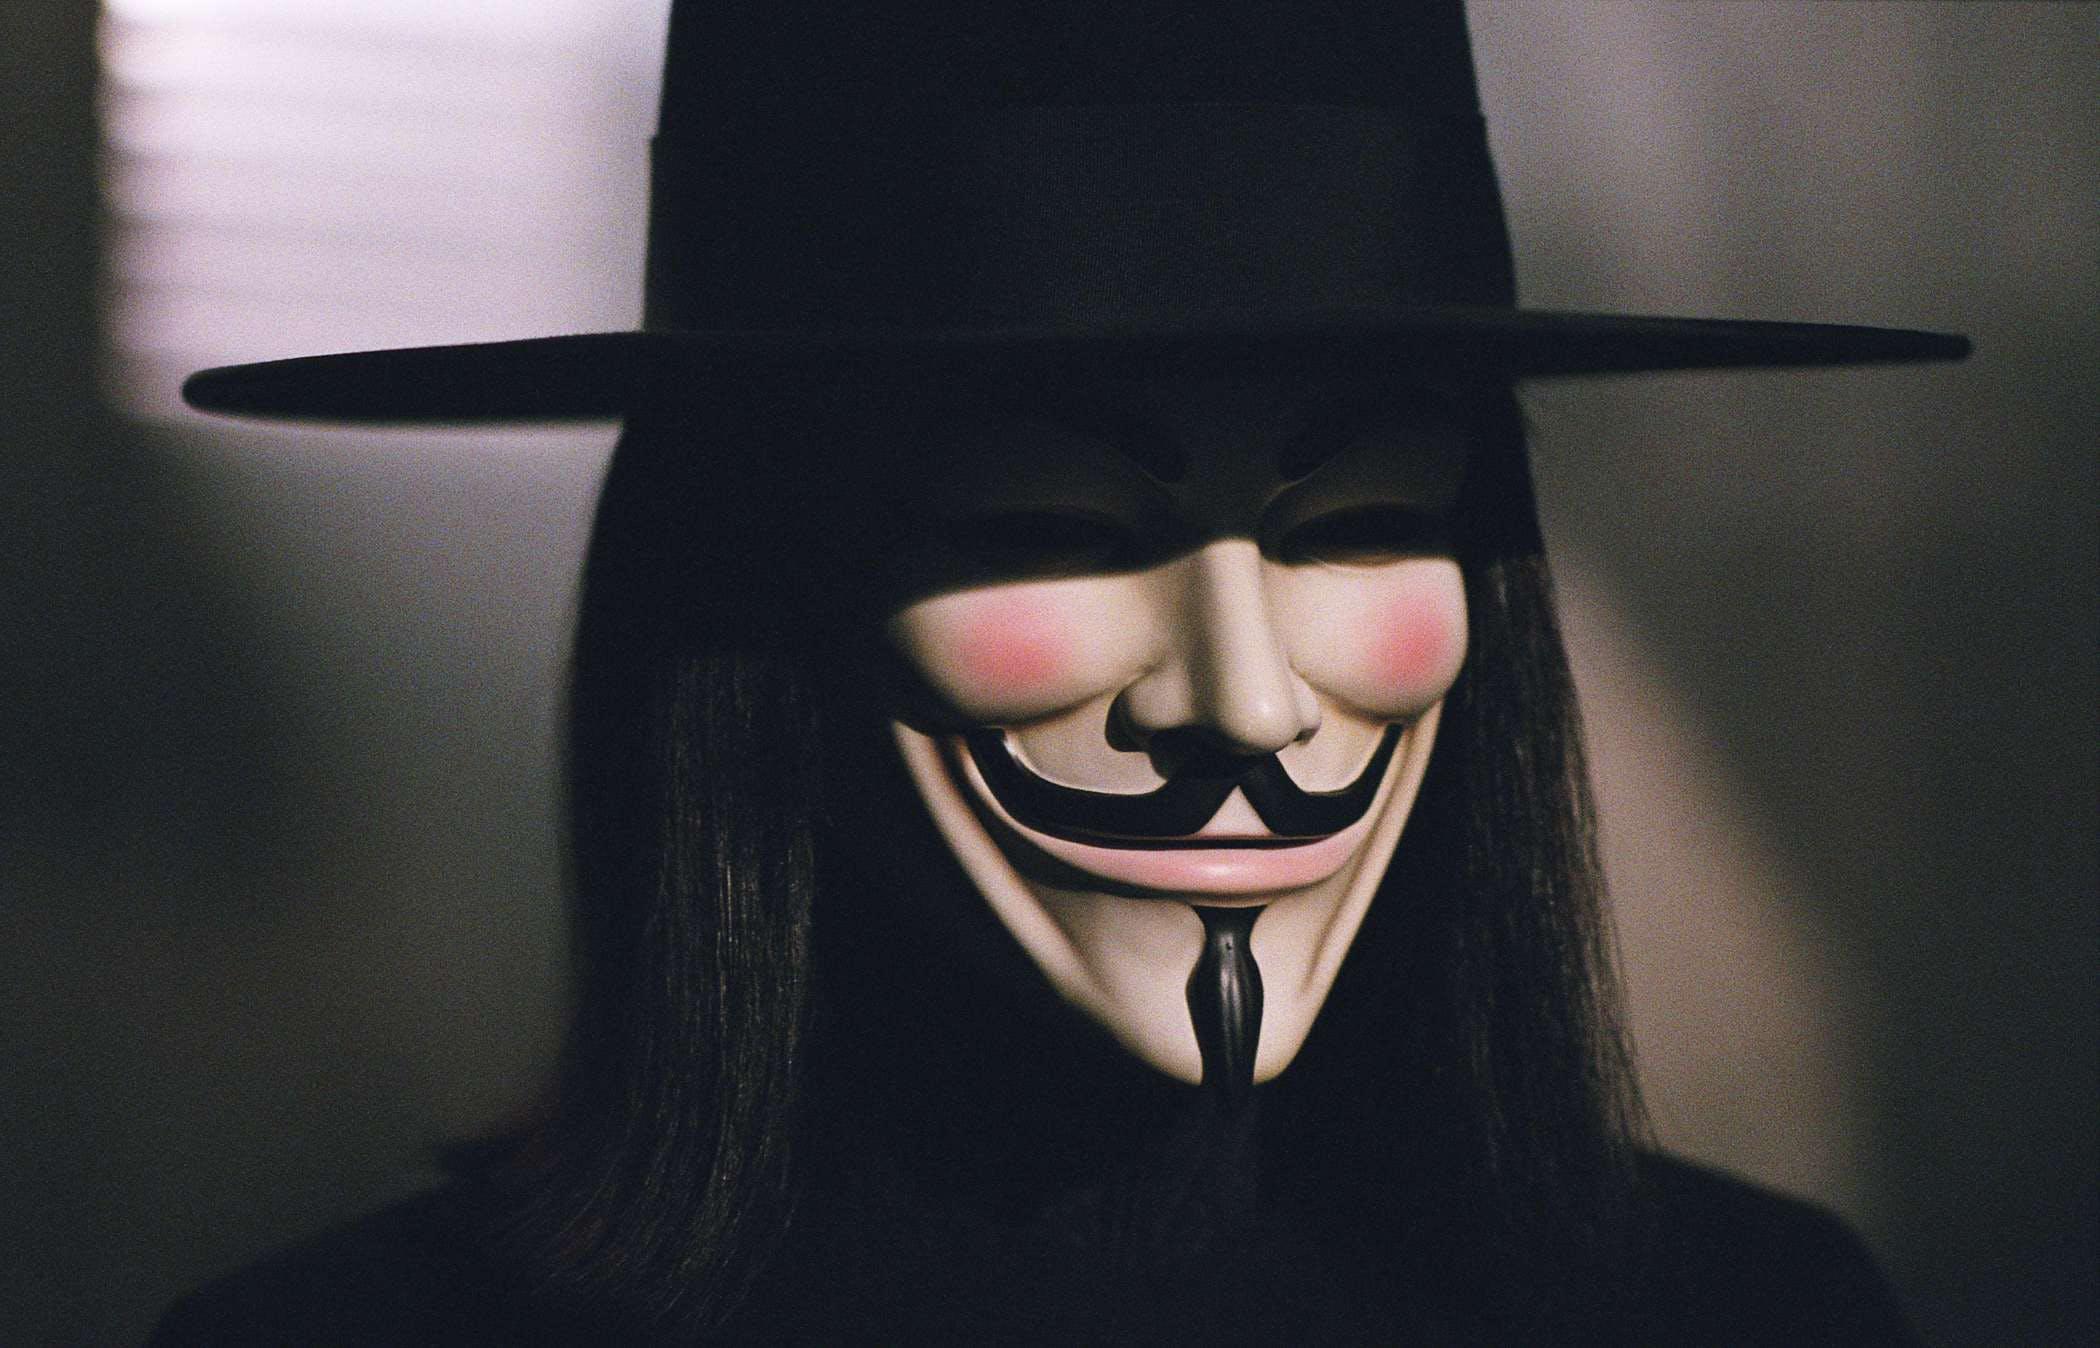 V for Vendetta 5th